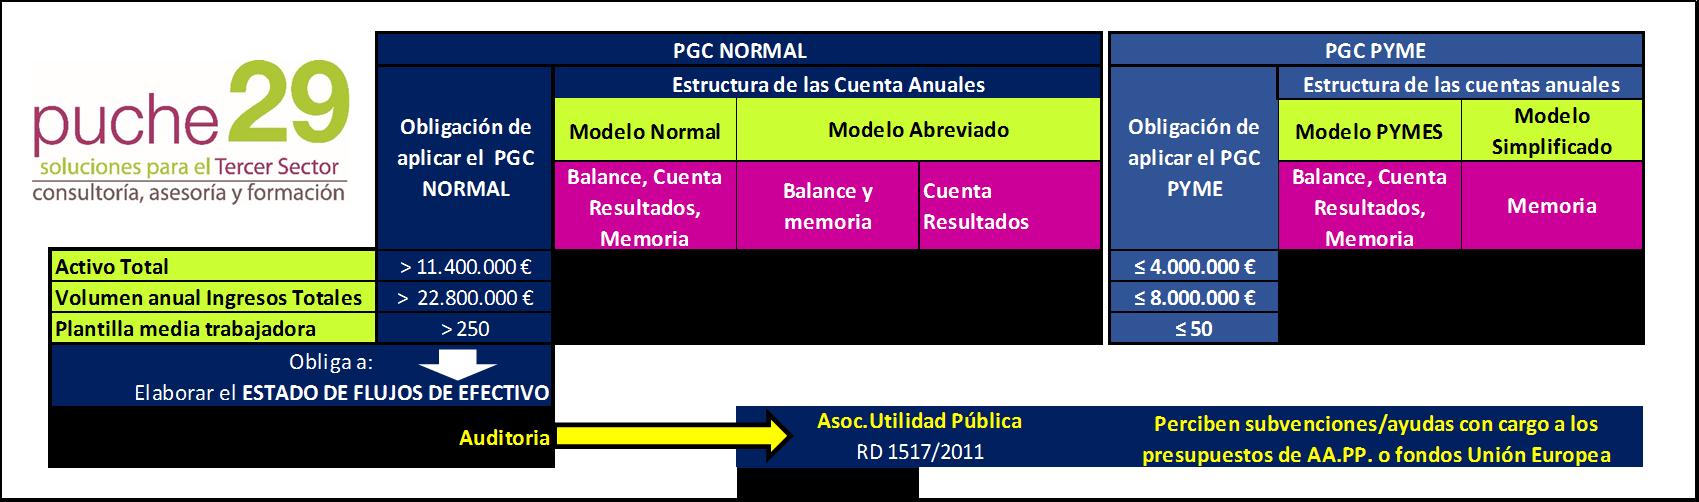 PGC-PYME